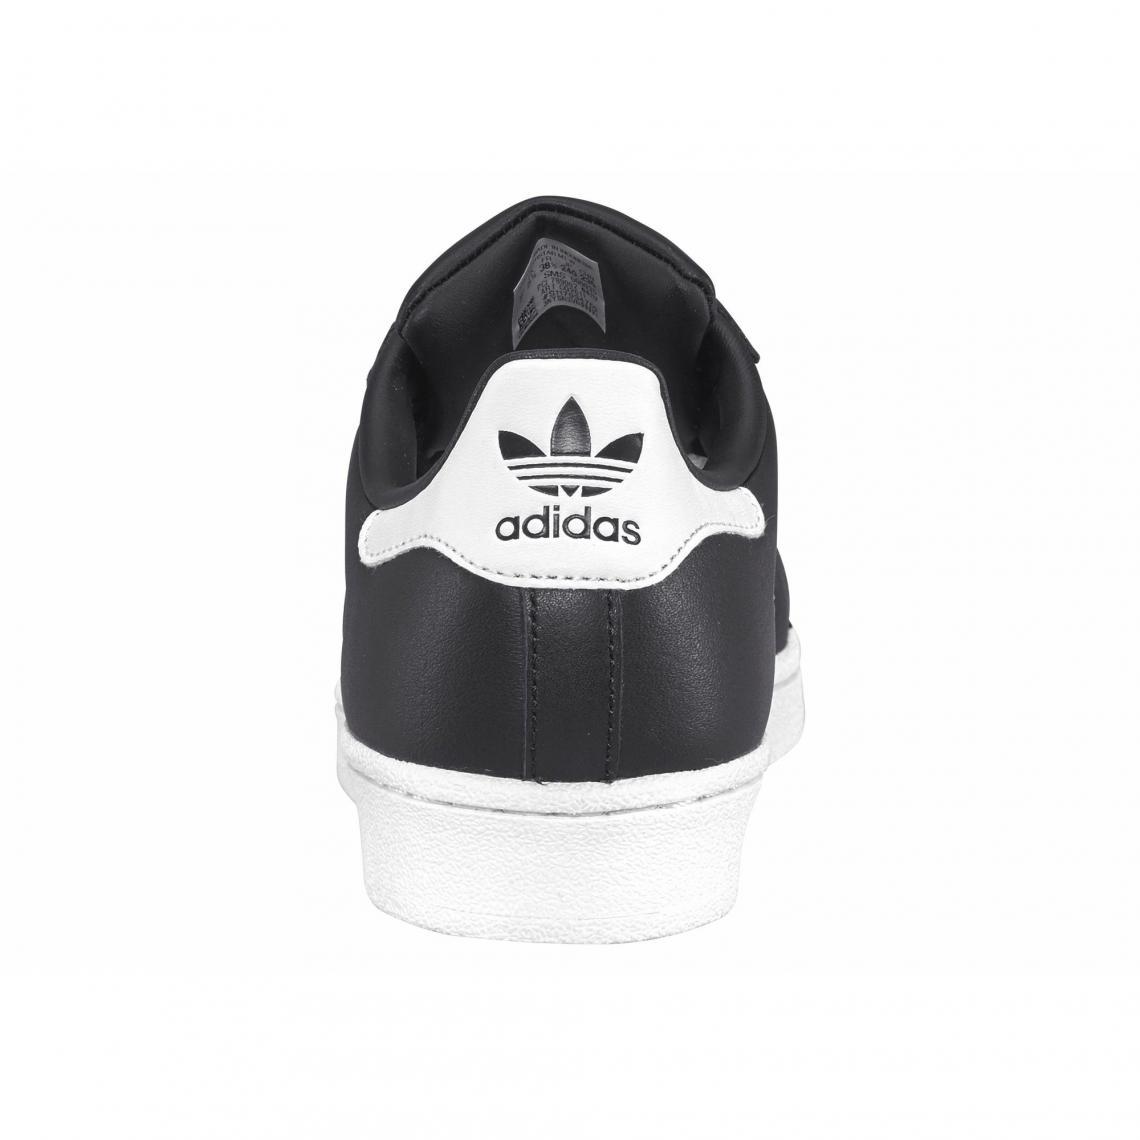 598dd8df5ab Baskets femme bout argenté SuperStar MTW adidas Originals Adidas Originals